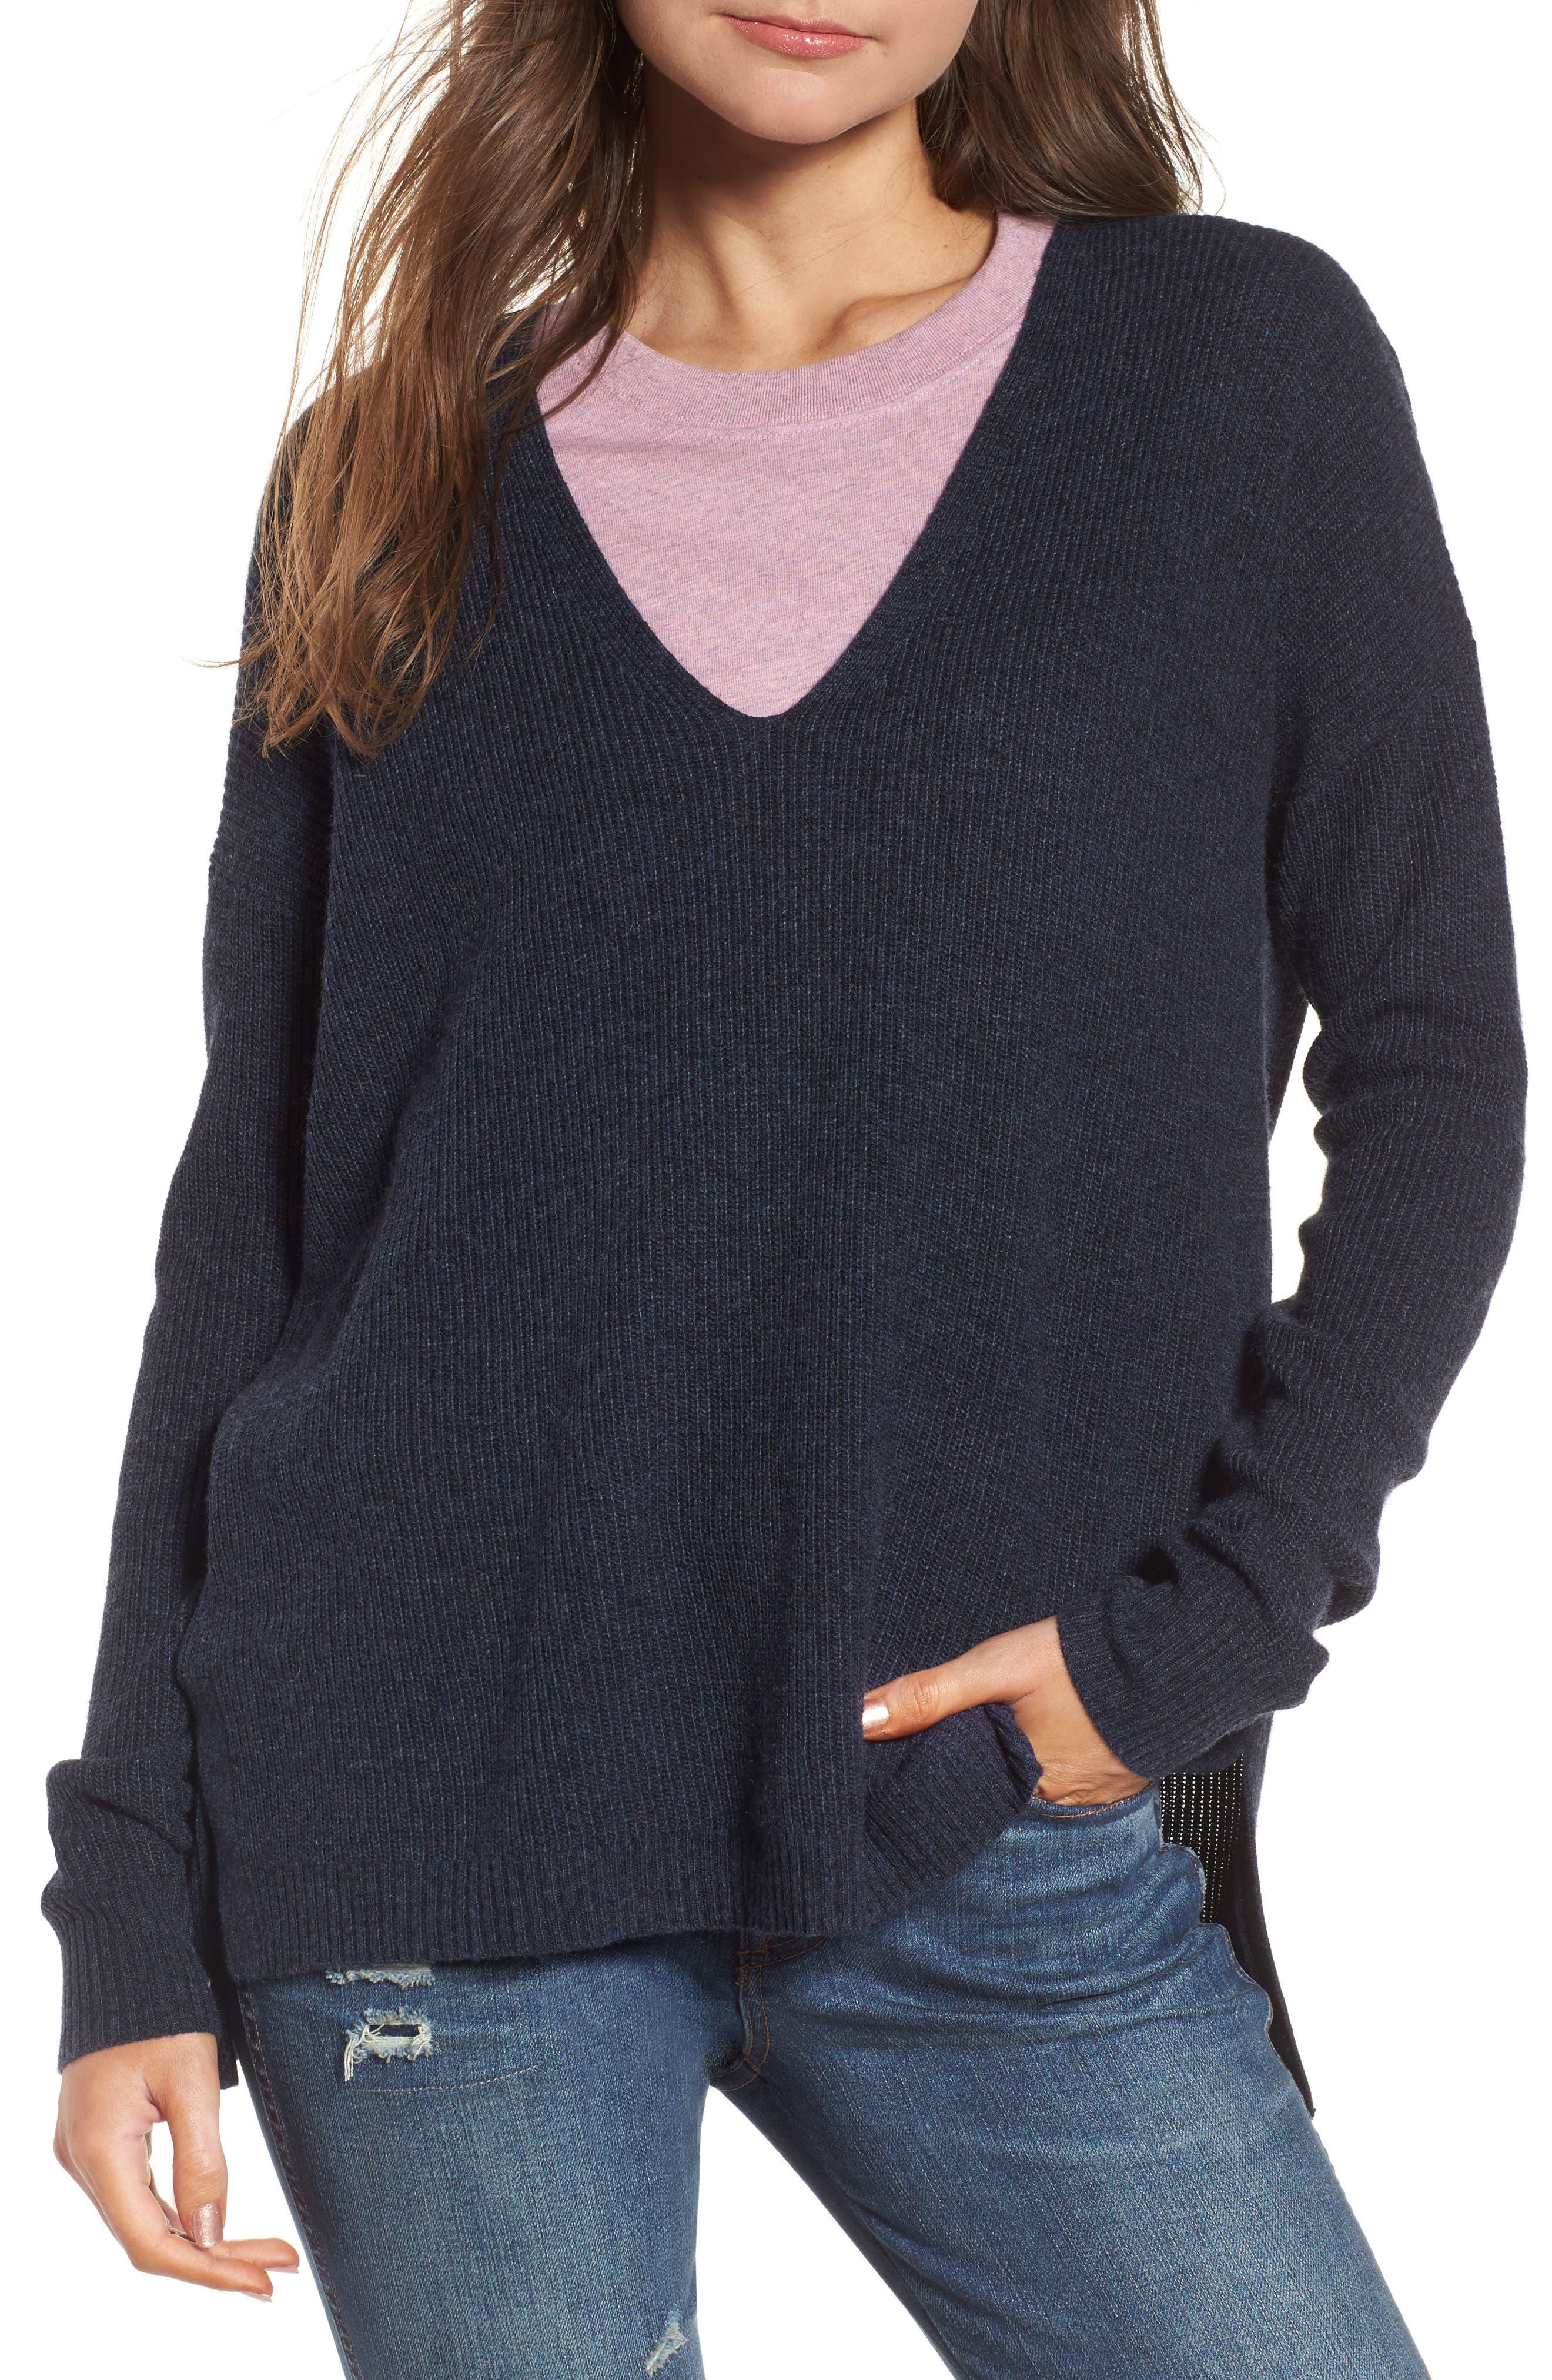 Warmlight V-Neck Sweater,                             Main thumbnail 1, color,                             400